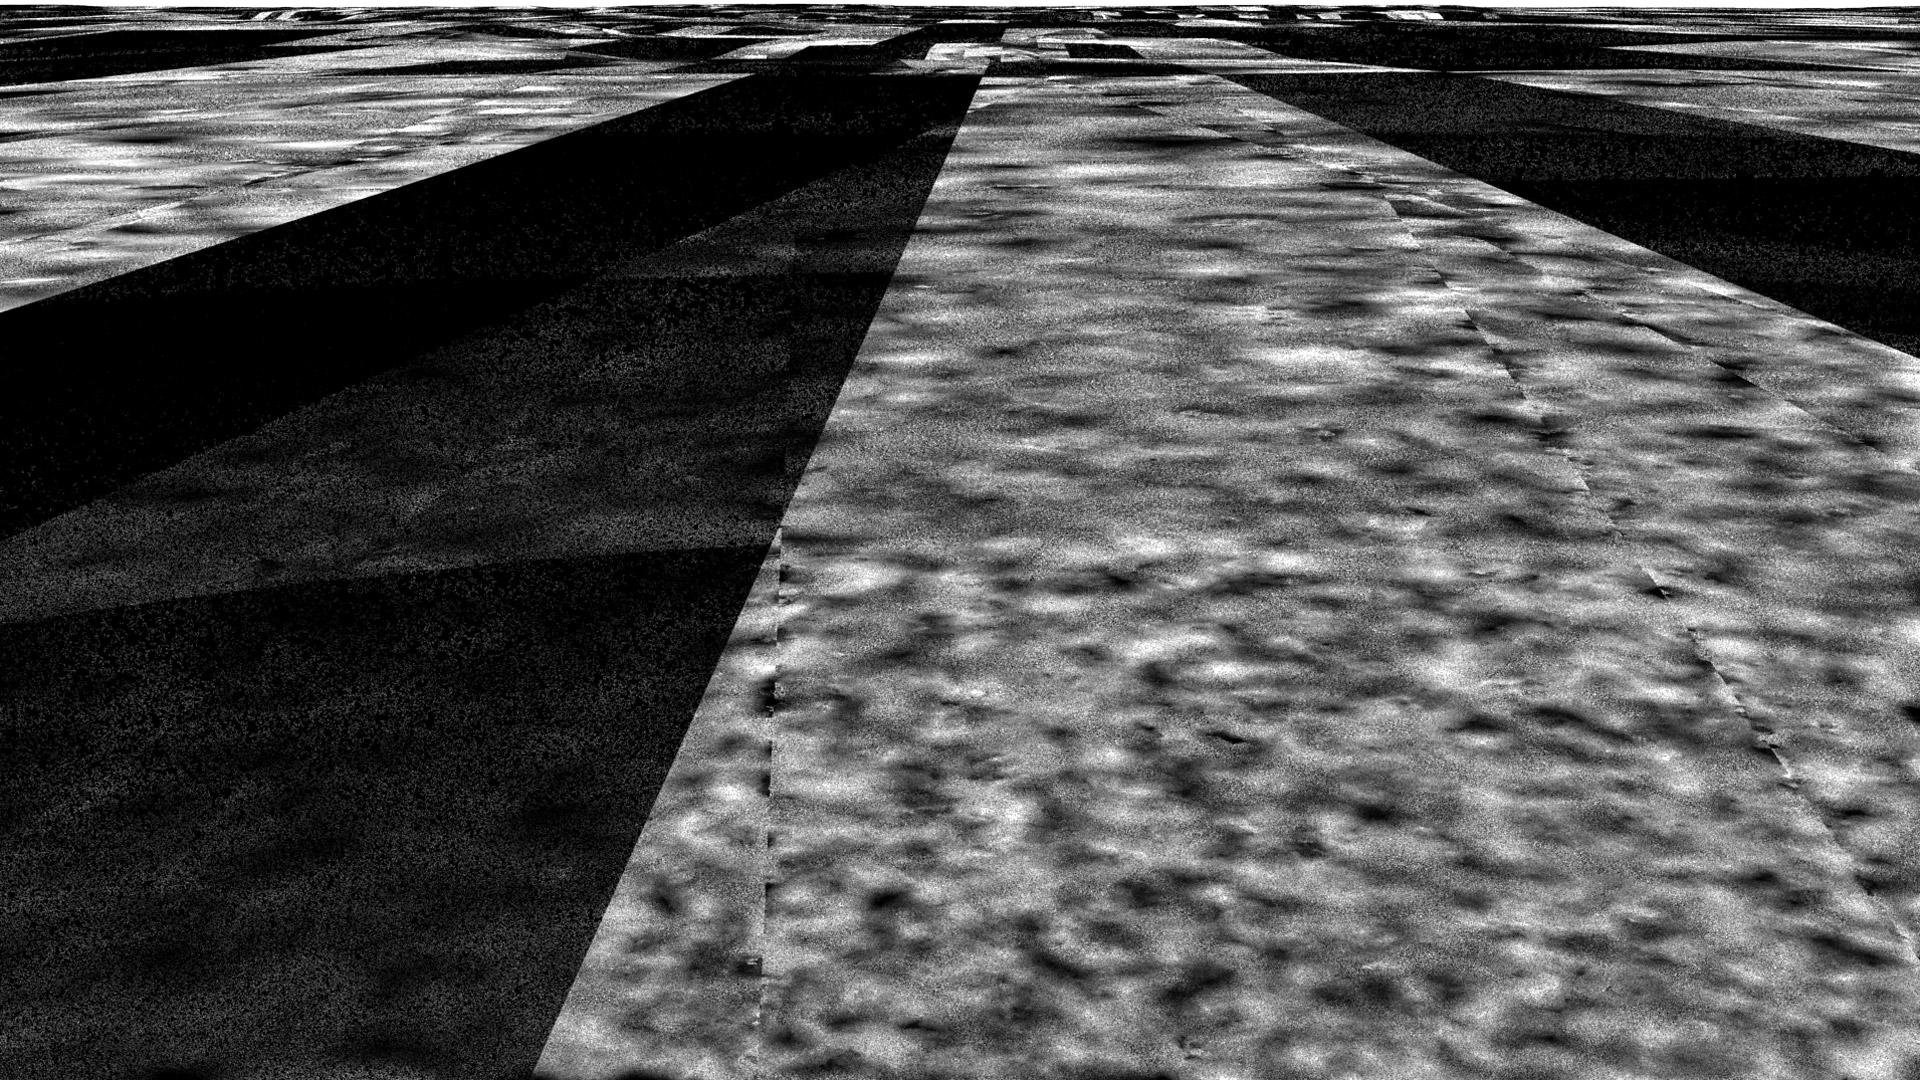 3_Desert_fleuryfontaine_Galdric-Fleury-Antoine-Fontaine_2010_Web